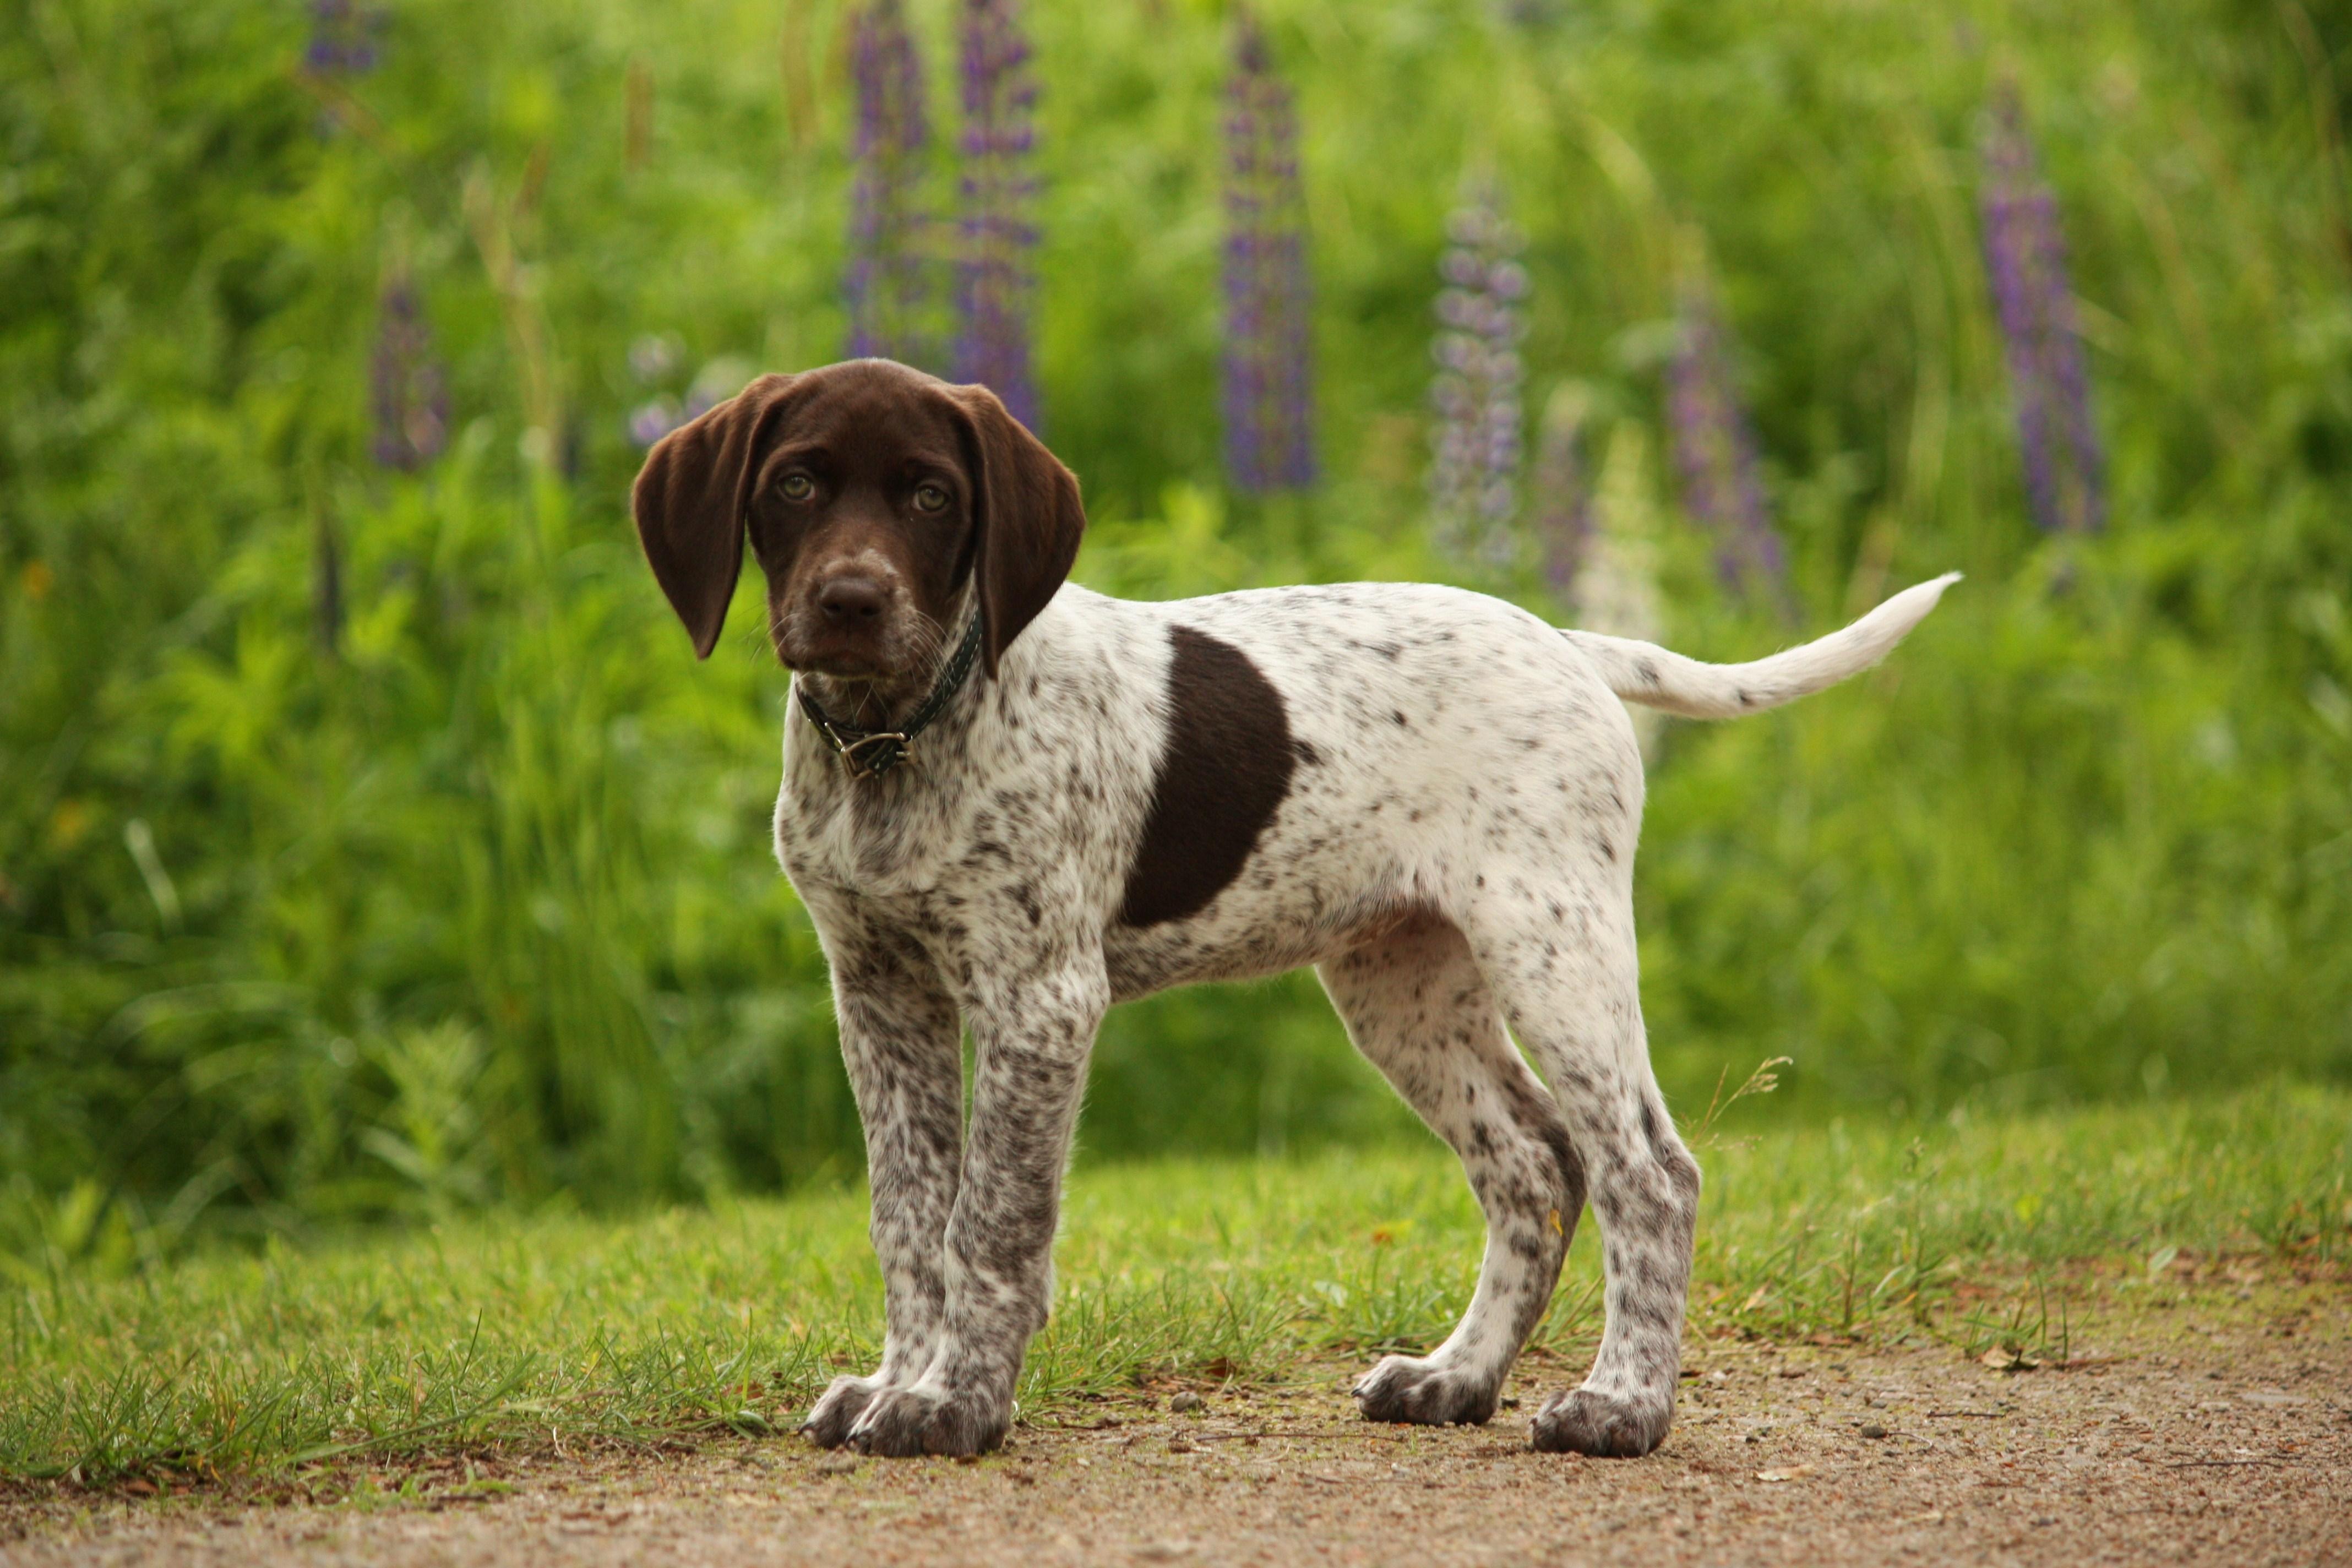 R T Pointer Great Dog Breeds - Ger...